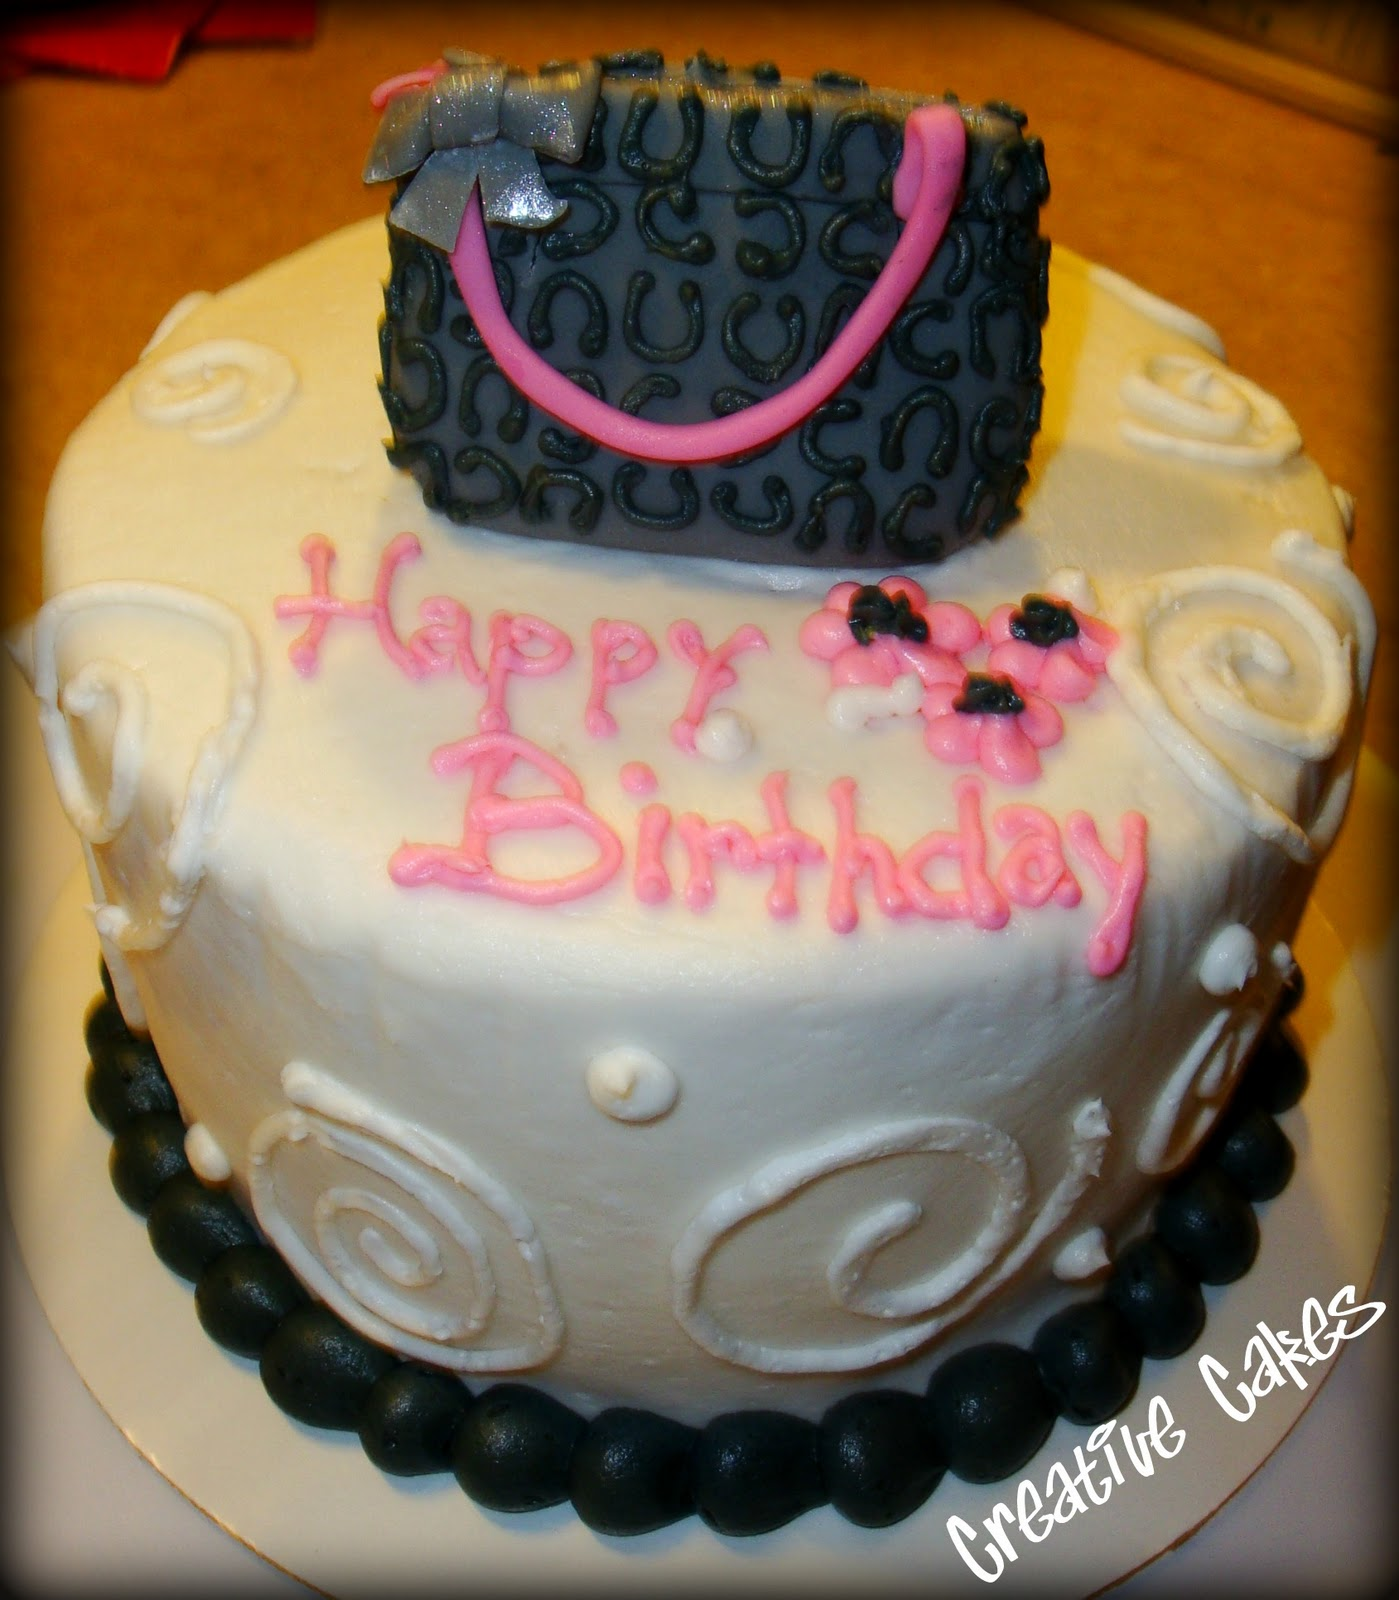 Awe Inspiring Coach Purse Birthday Cakes The Art Of Mike Mignola Birthday Cards Printable Giouspongecafe Filternl